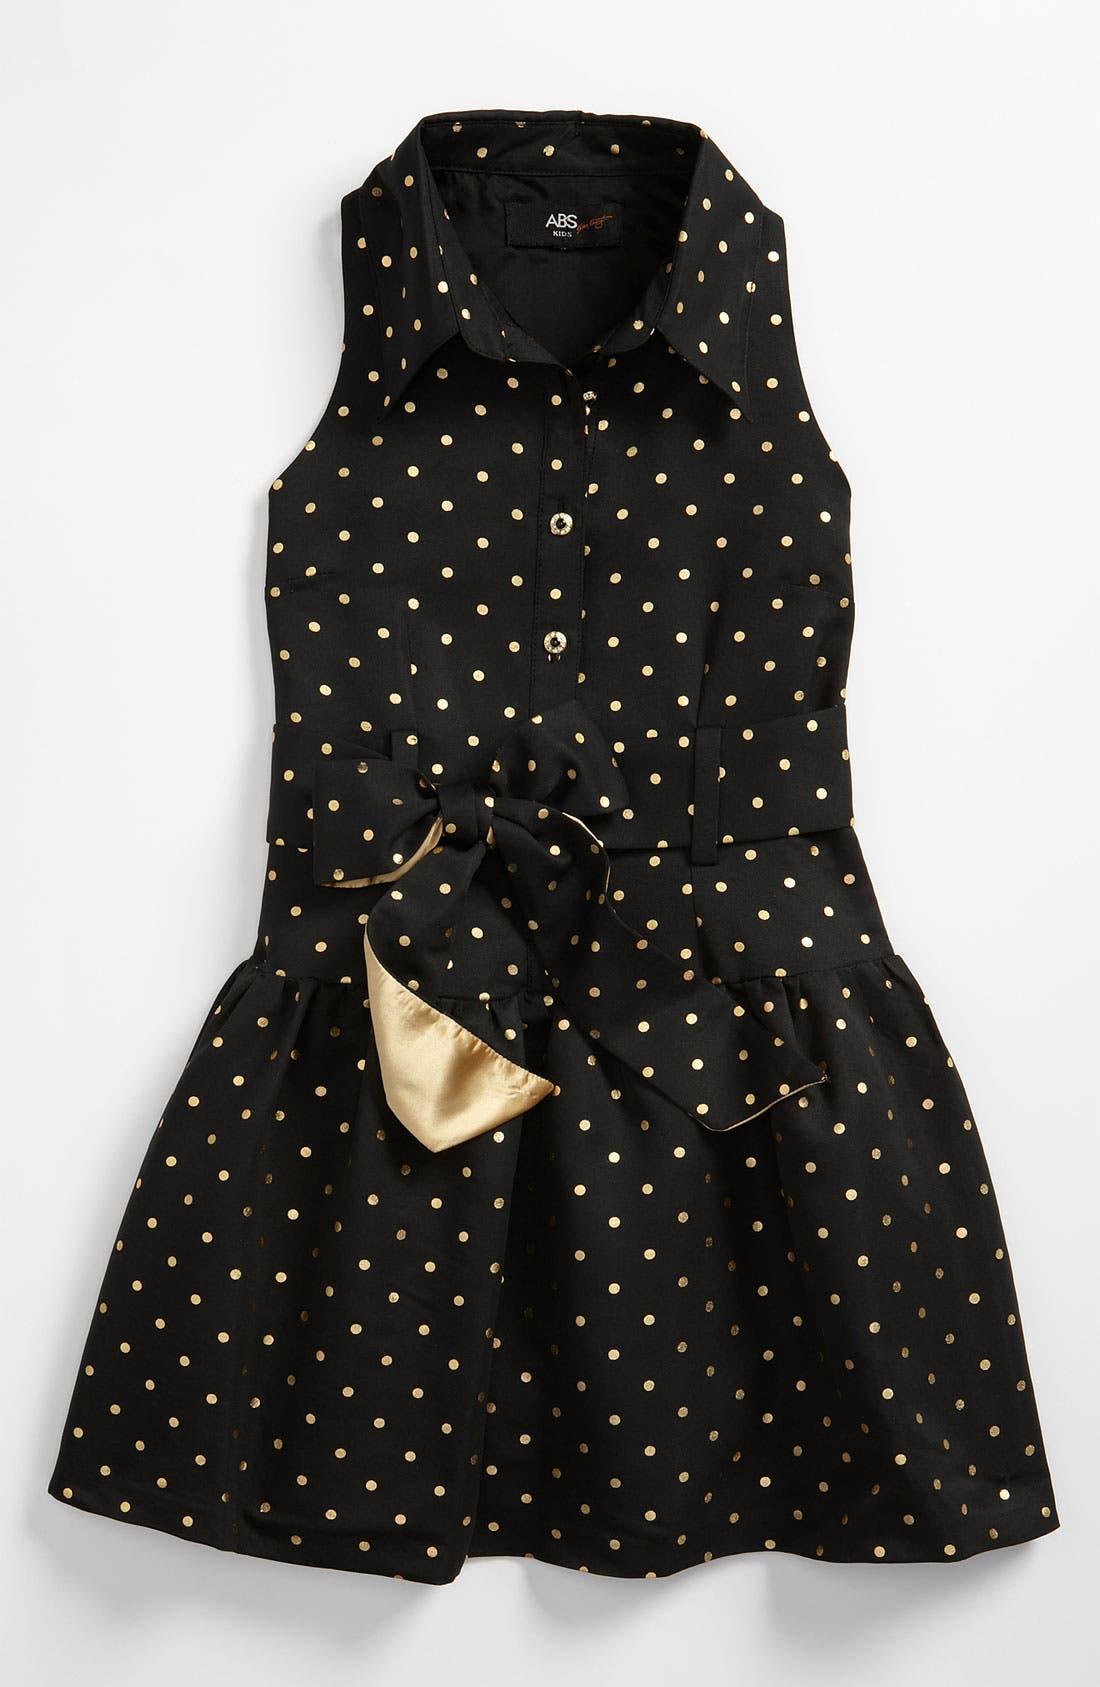 Alternate Image 1 Selected - ABS by Allen Schwartz Polka Dot Shirtdress (Big Girls)